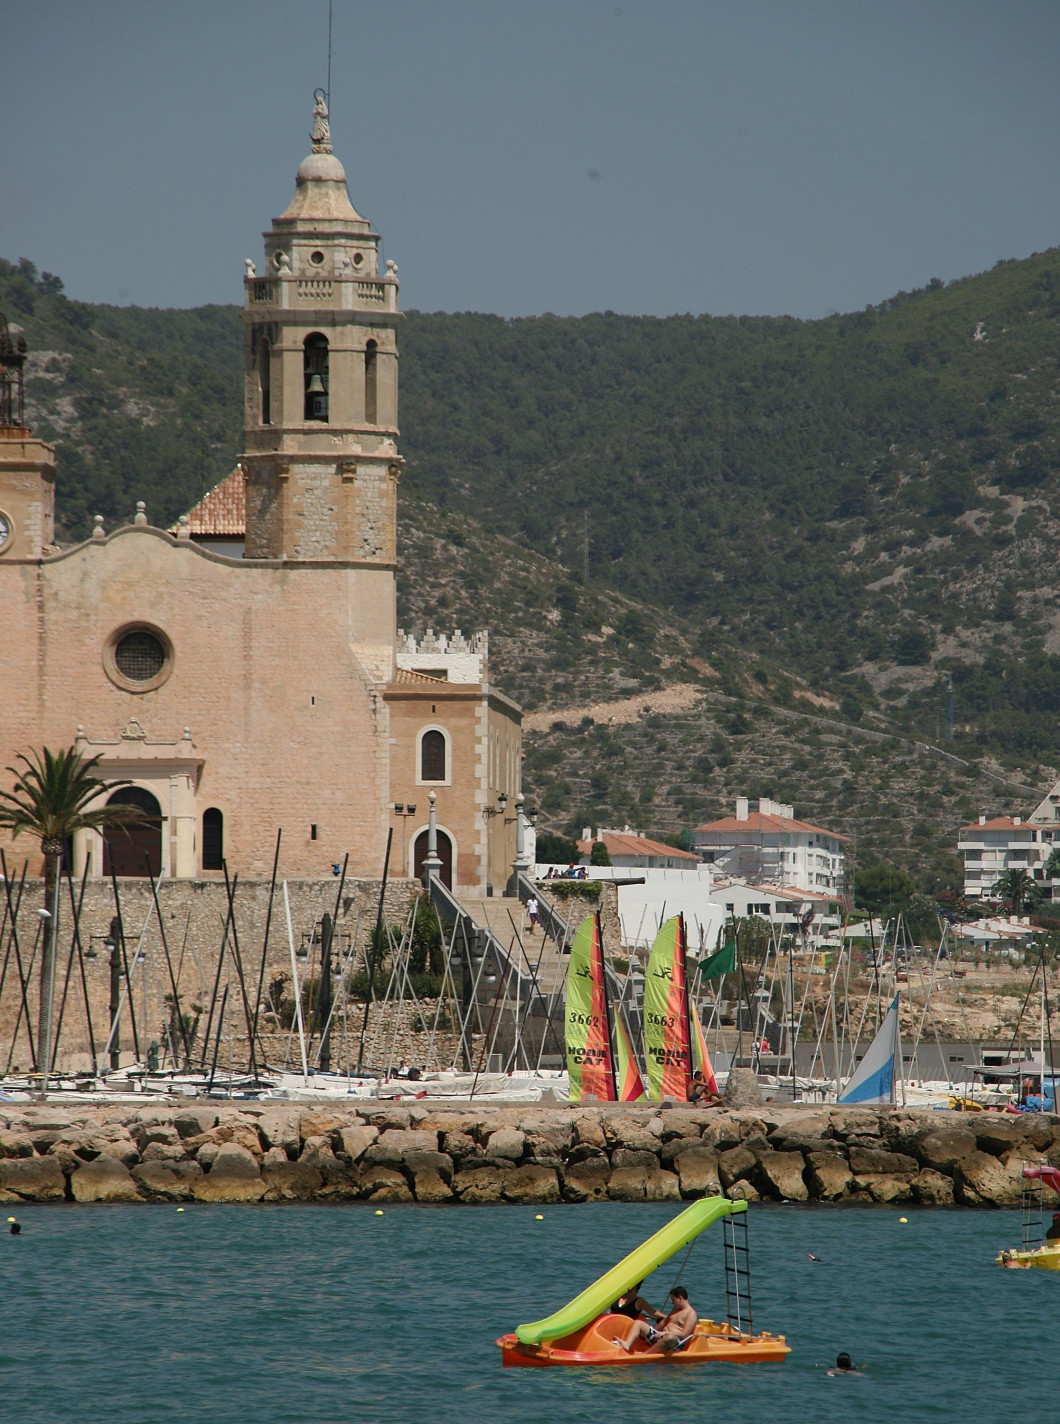 Tourist Photos of Spain